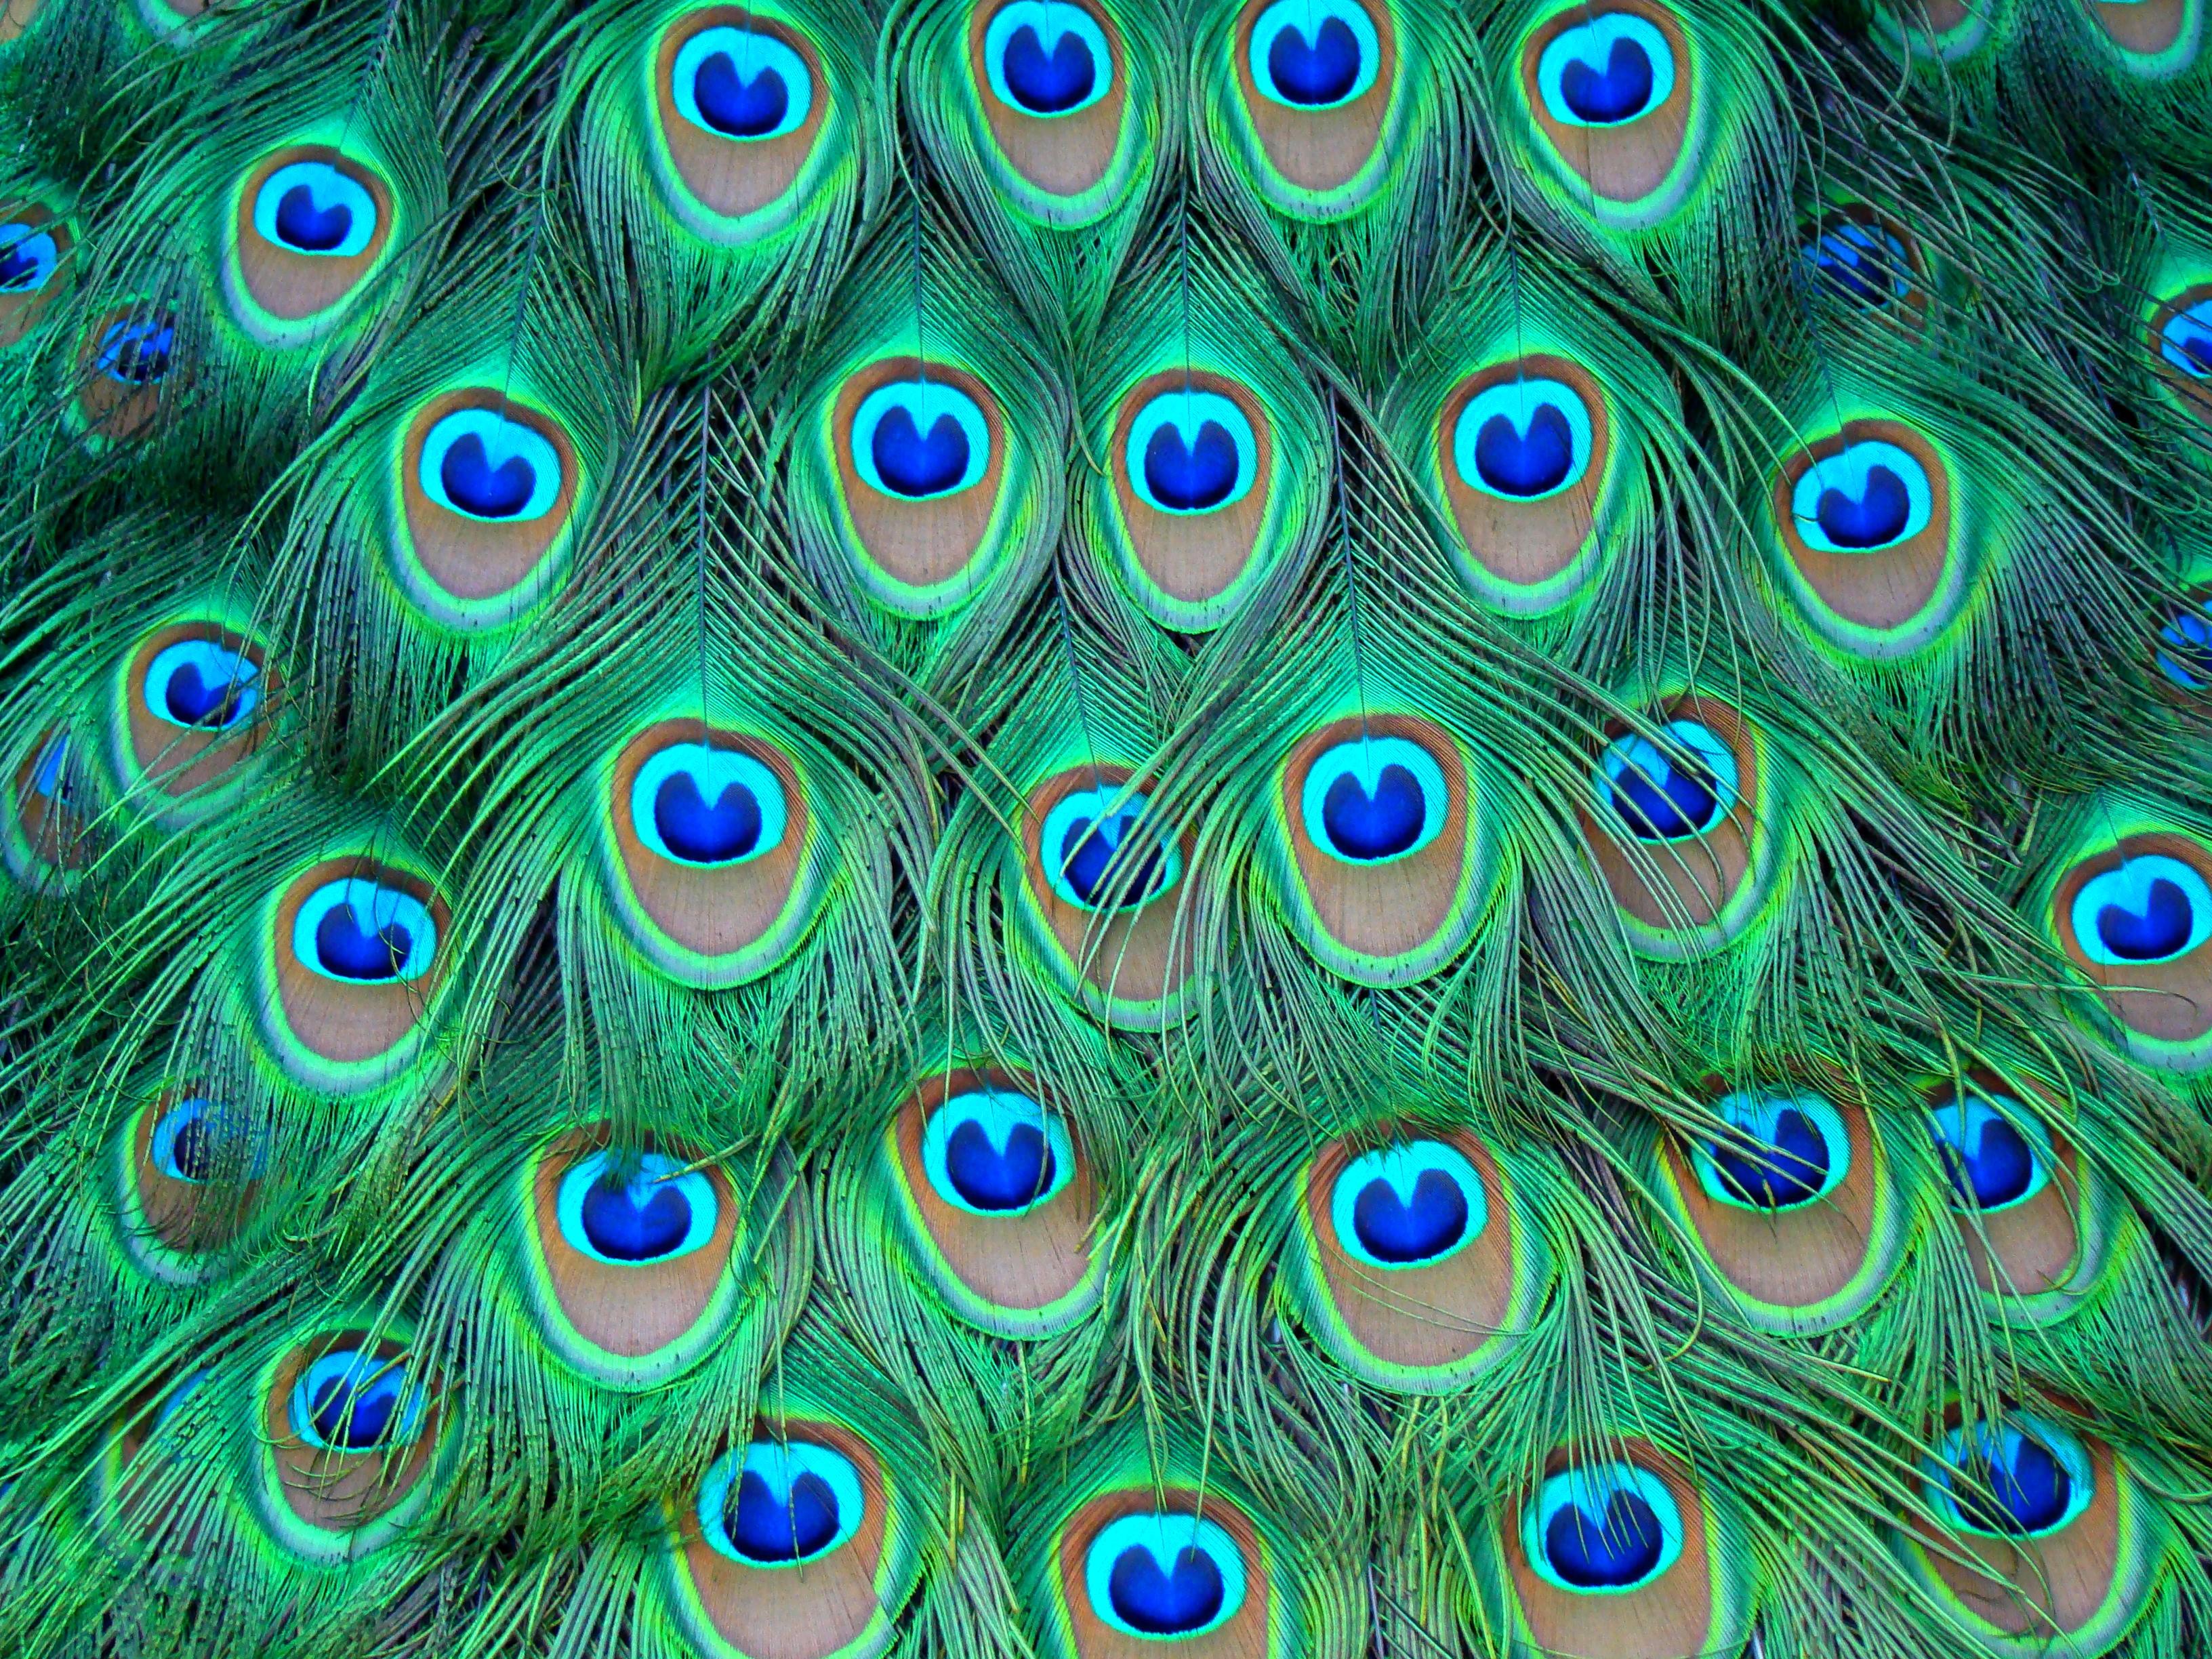 hd-desktop-wallpaper-peacock